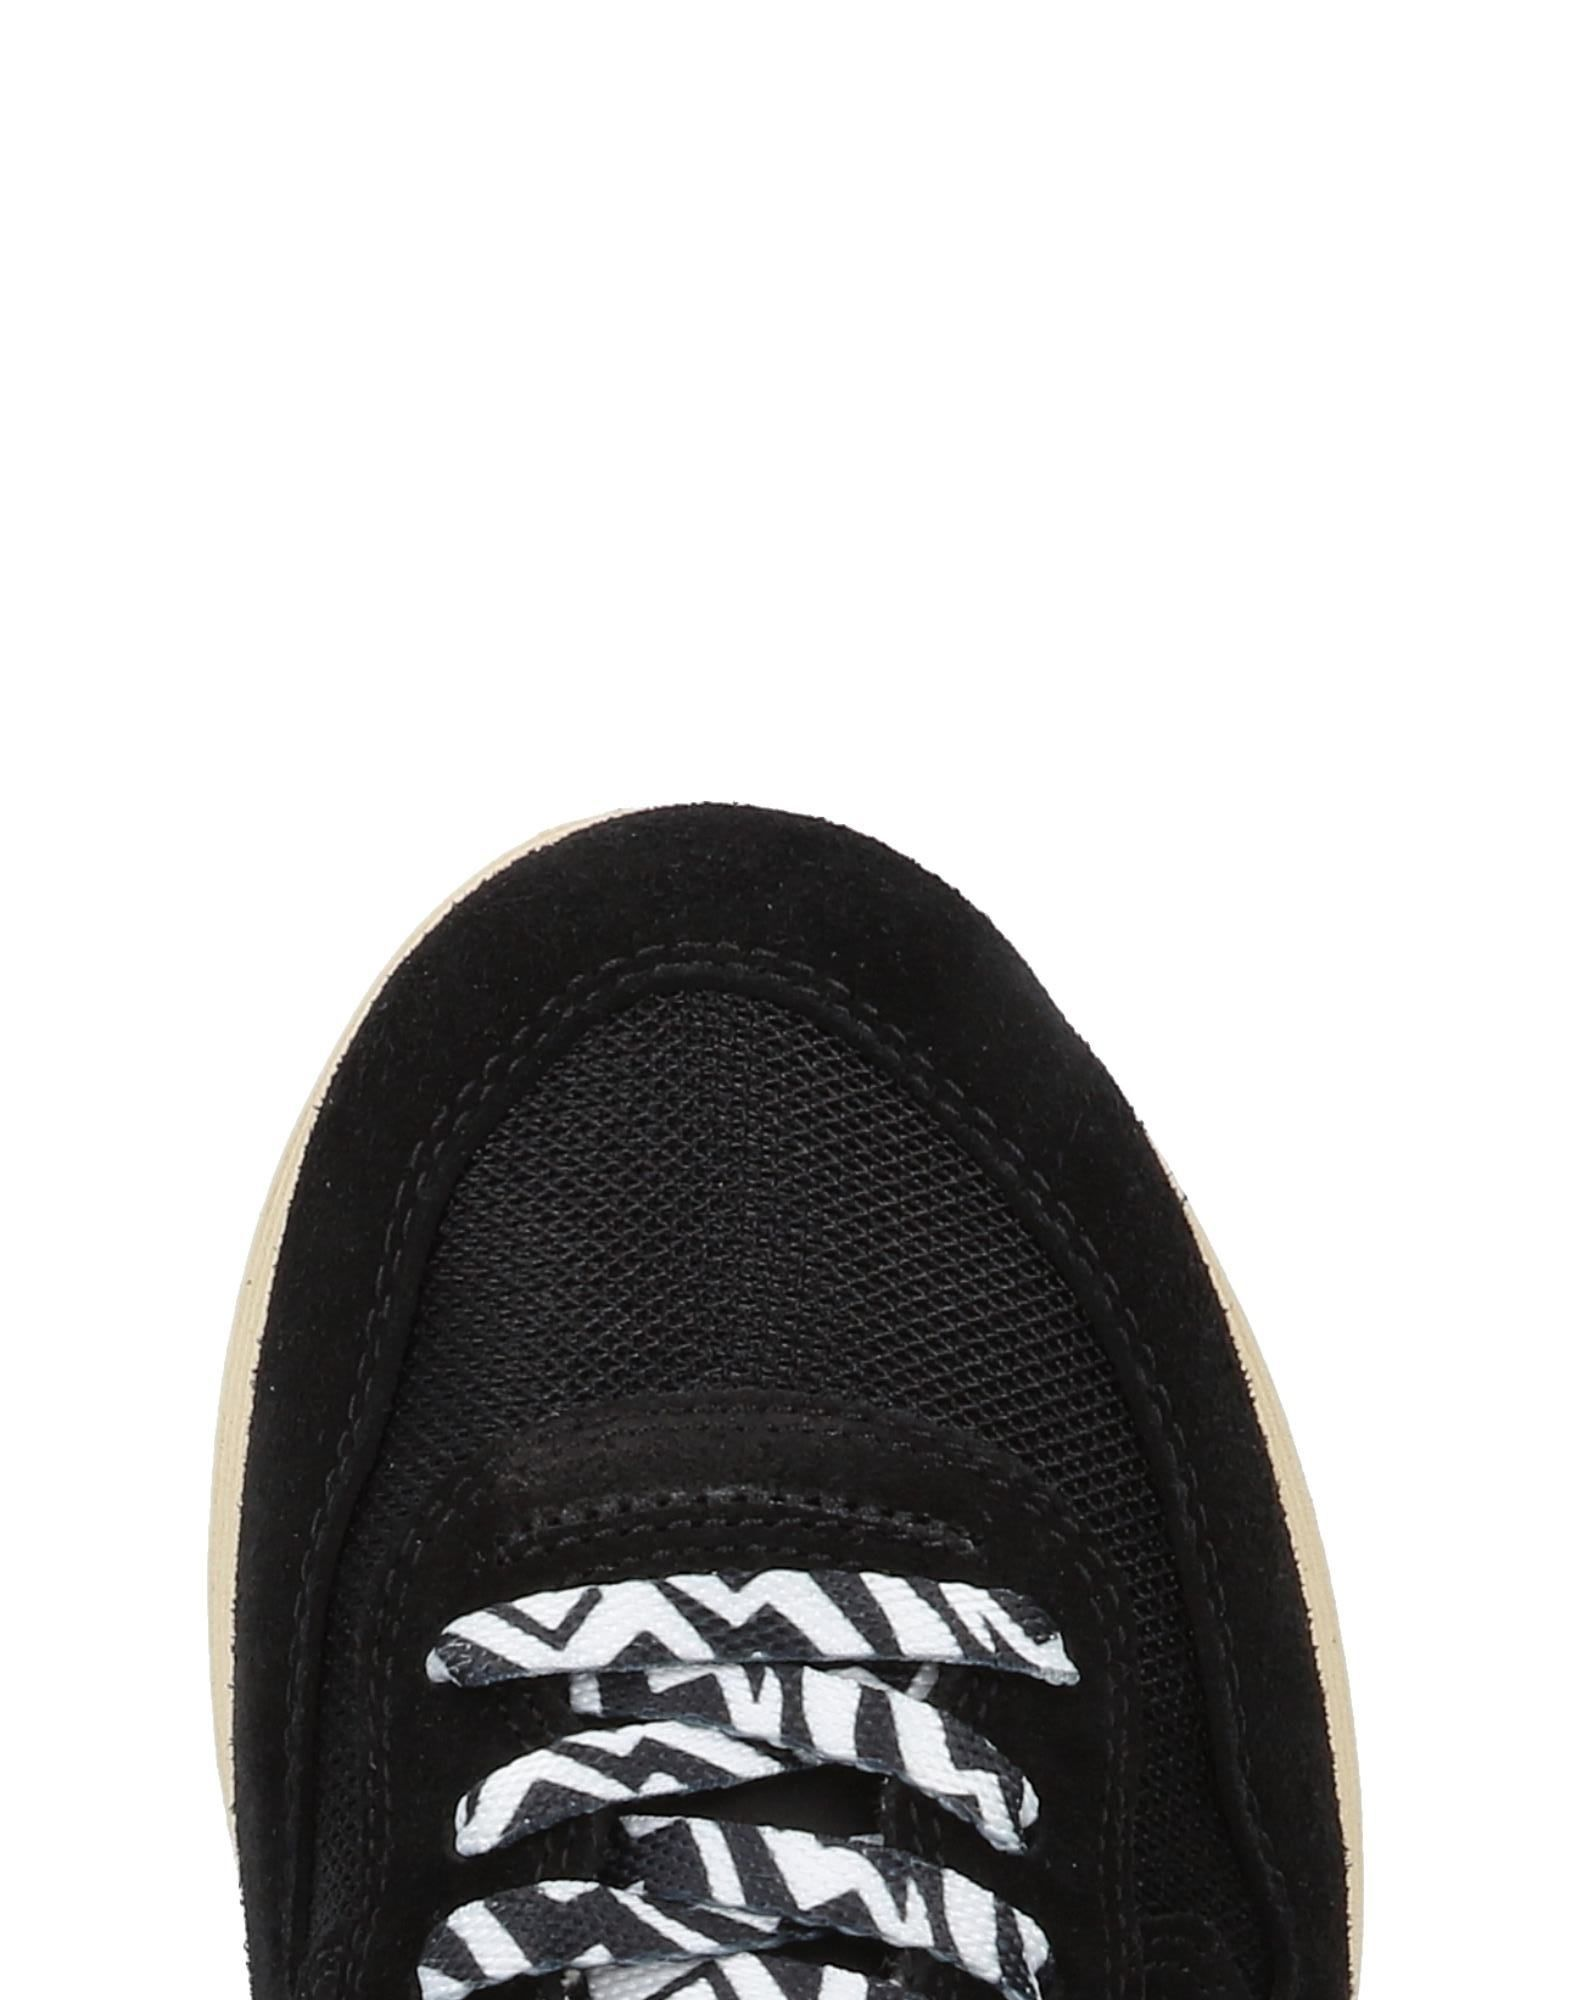 Stilvolle Goose billige Schuhe Haus Golden Goose Stilvolle Sneakers Damen  11470217FP 628bd8